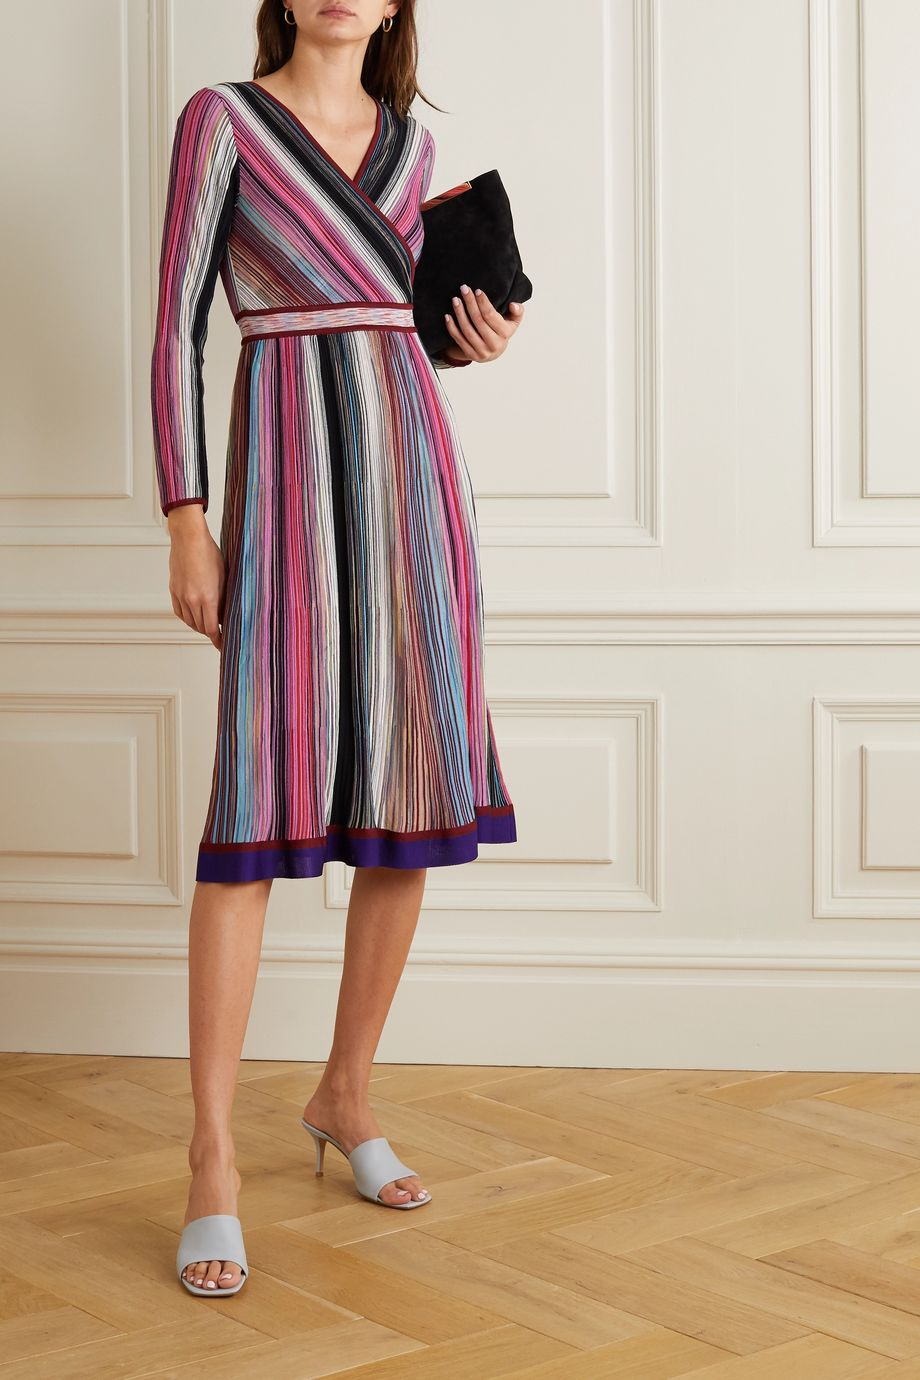 Missoni Kleid aus gestreiftem Häkelstrick mit Wickeleffekt